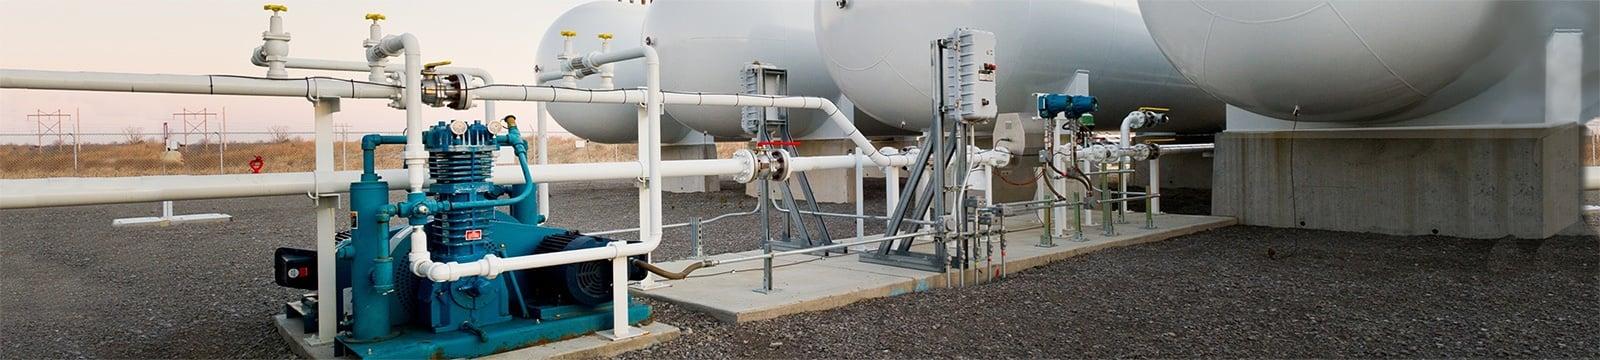 NGL LPG Storage & Handling Equipment - Pumps - Compressors - Tank Piers - Vaporizers.jpg